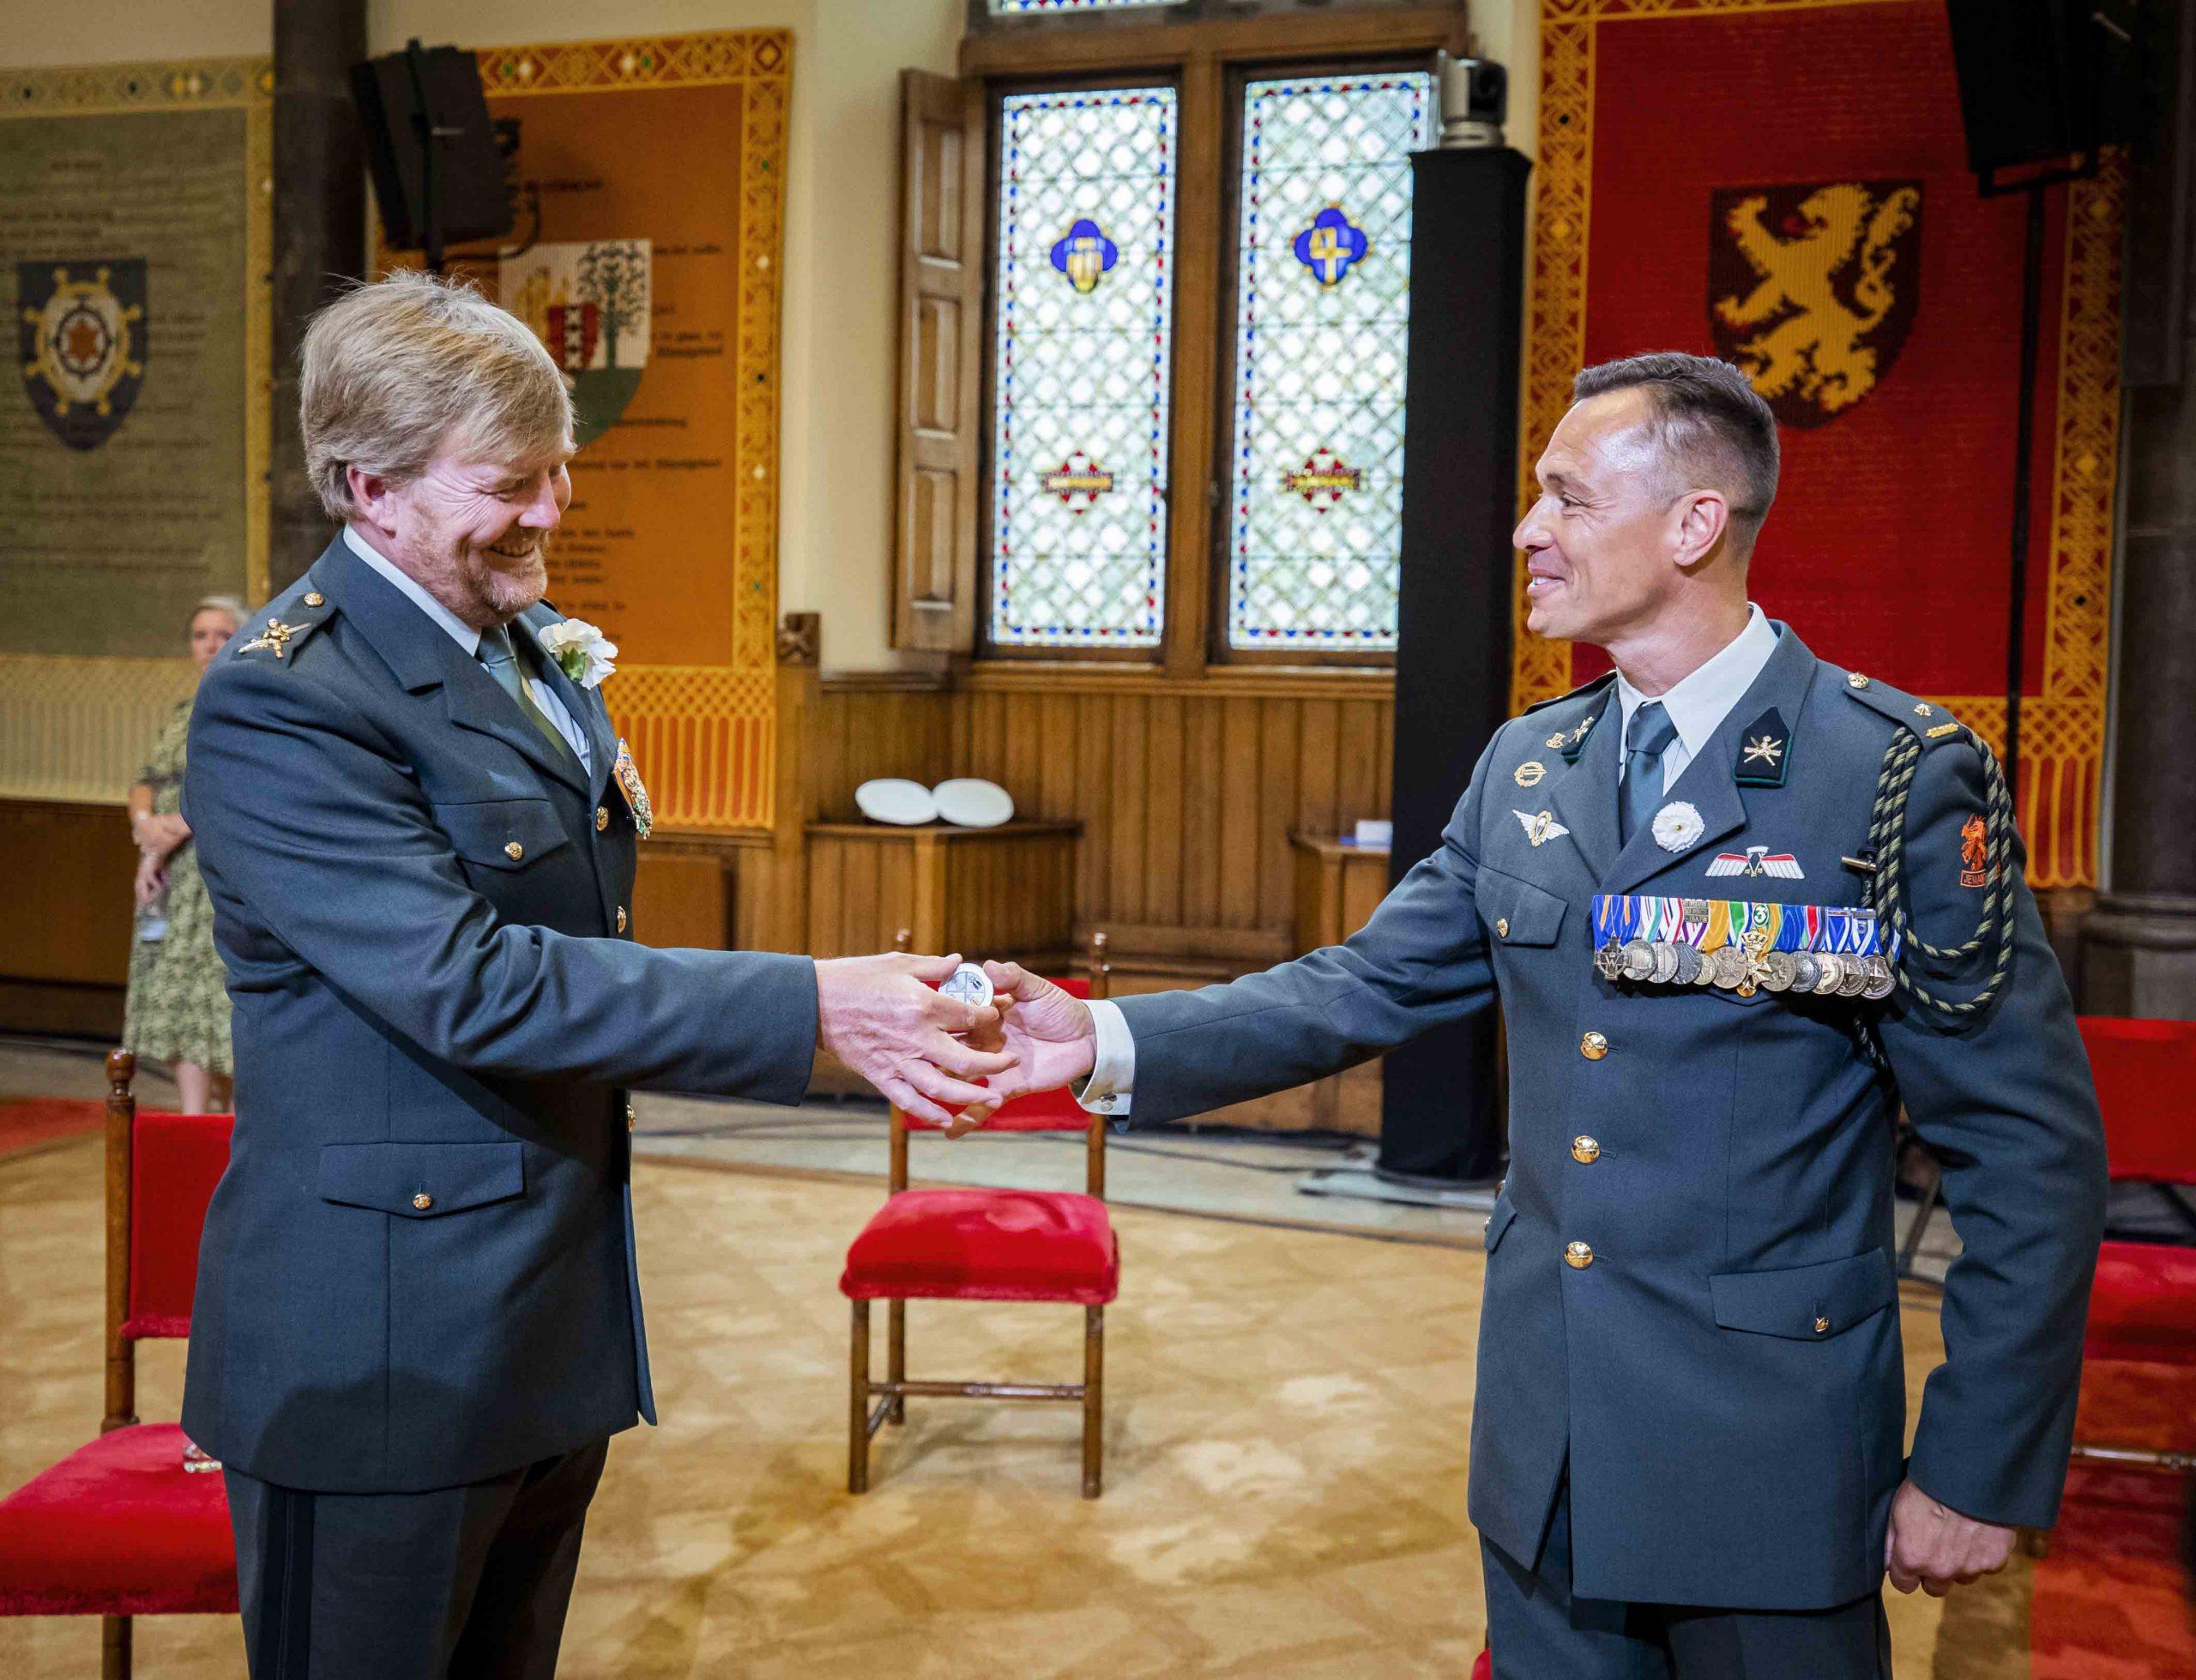 koning willem alexander nationale veteranendag6